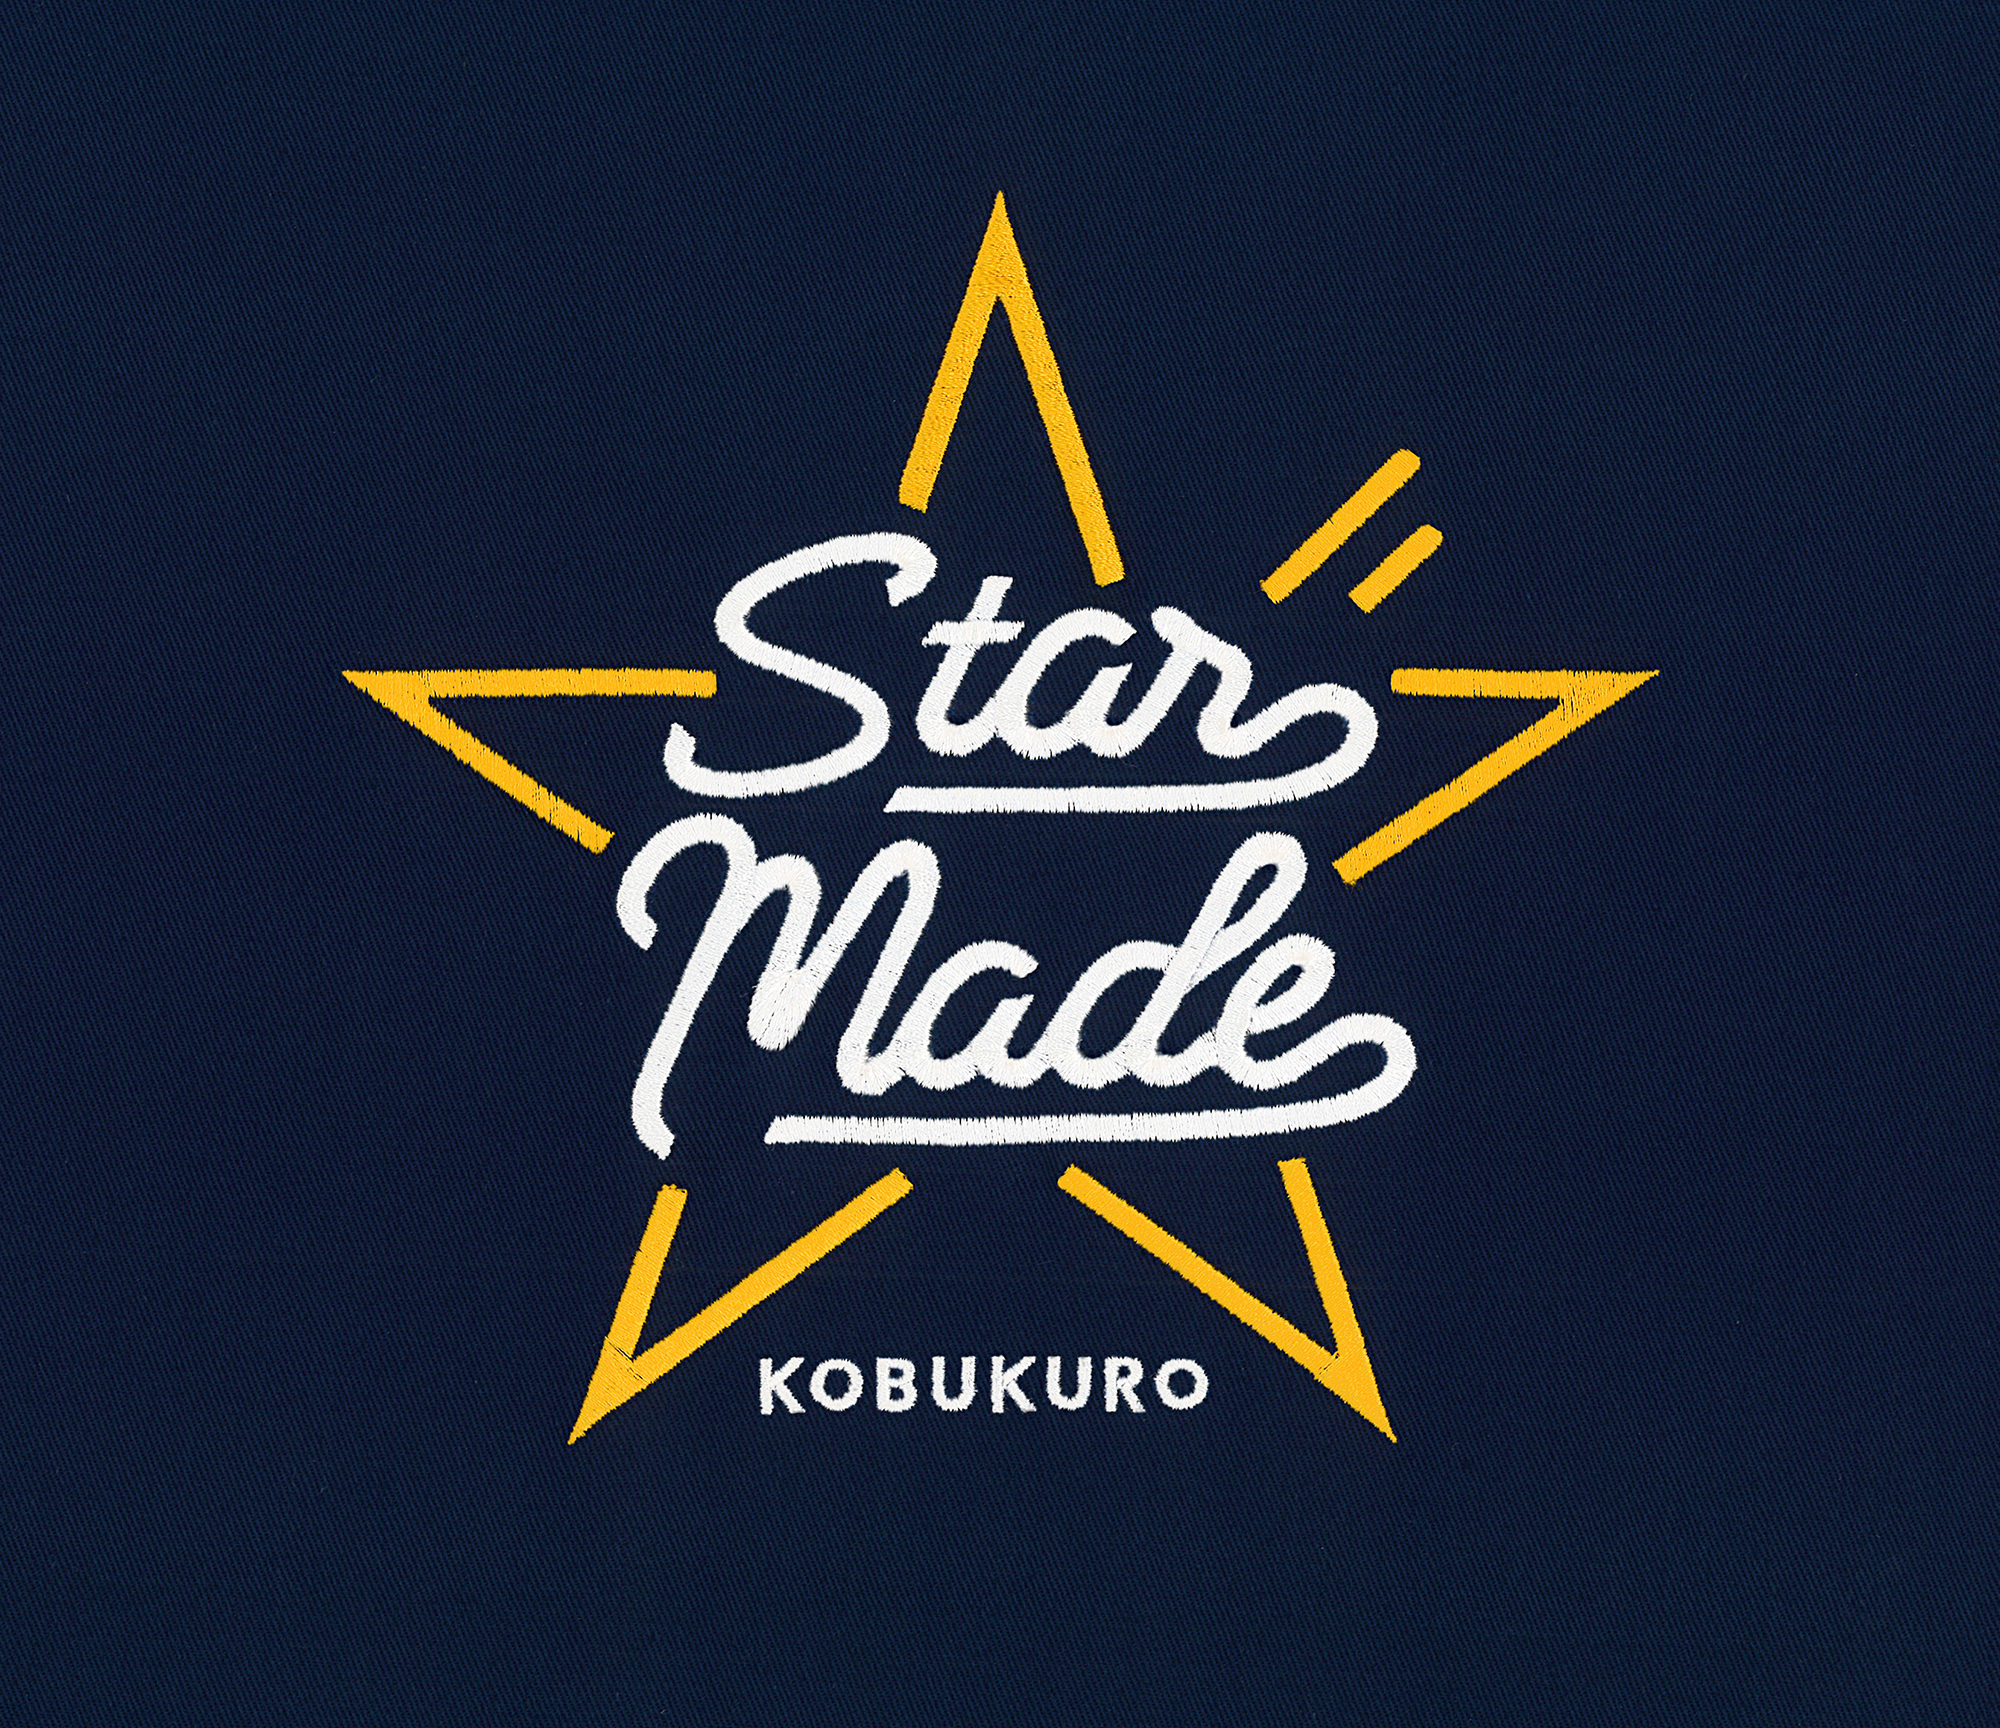 Star Made(初回限定盤)